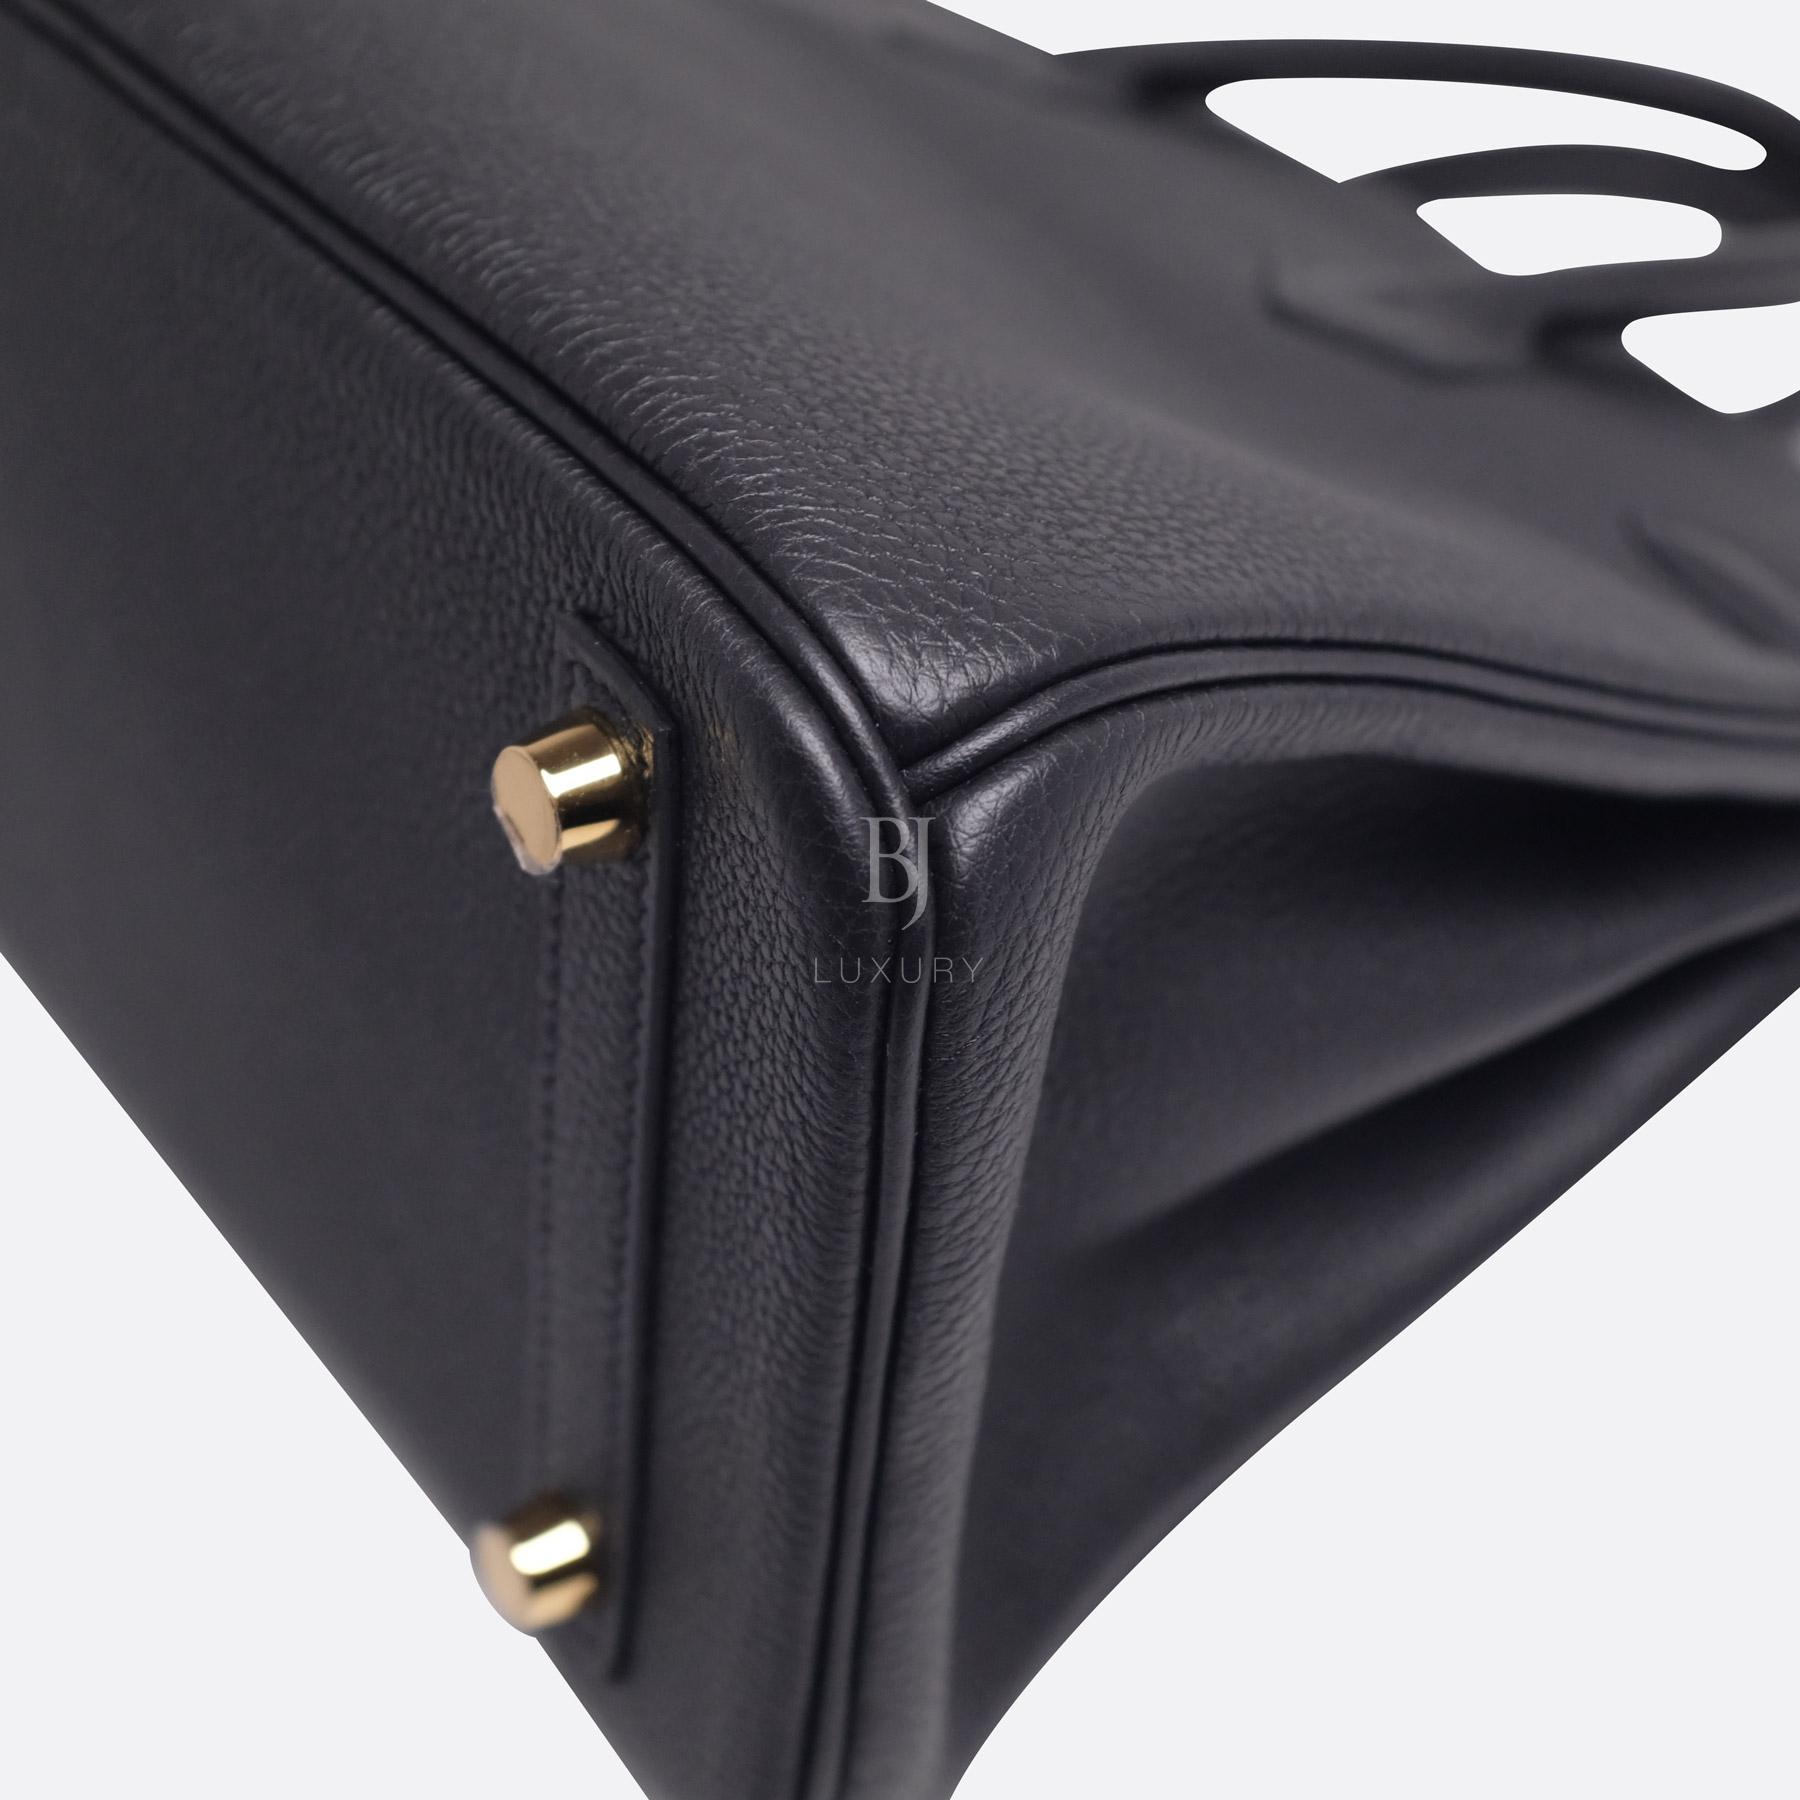 Hermes Birkin 25 Black Togo Gold Hardware BJ Luxury 14.jpg